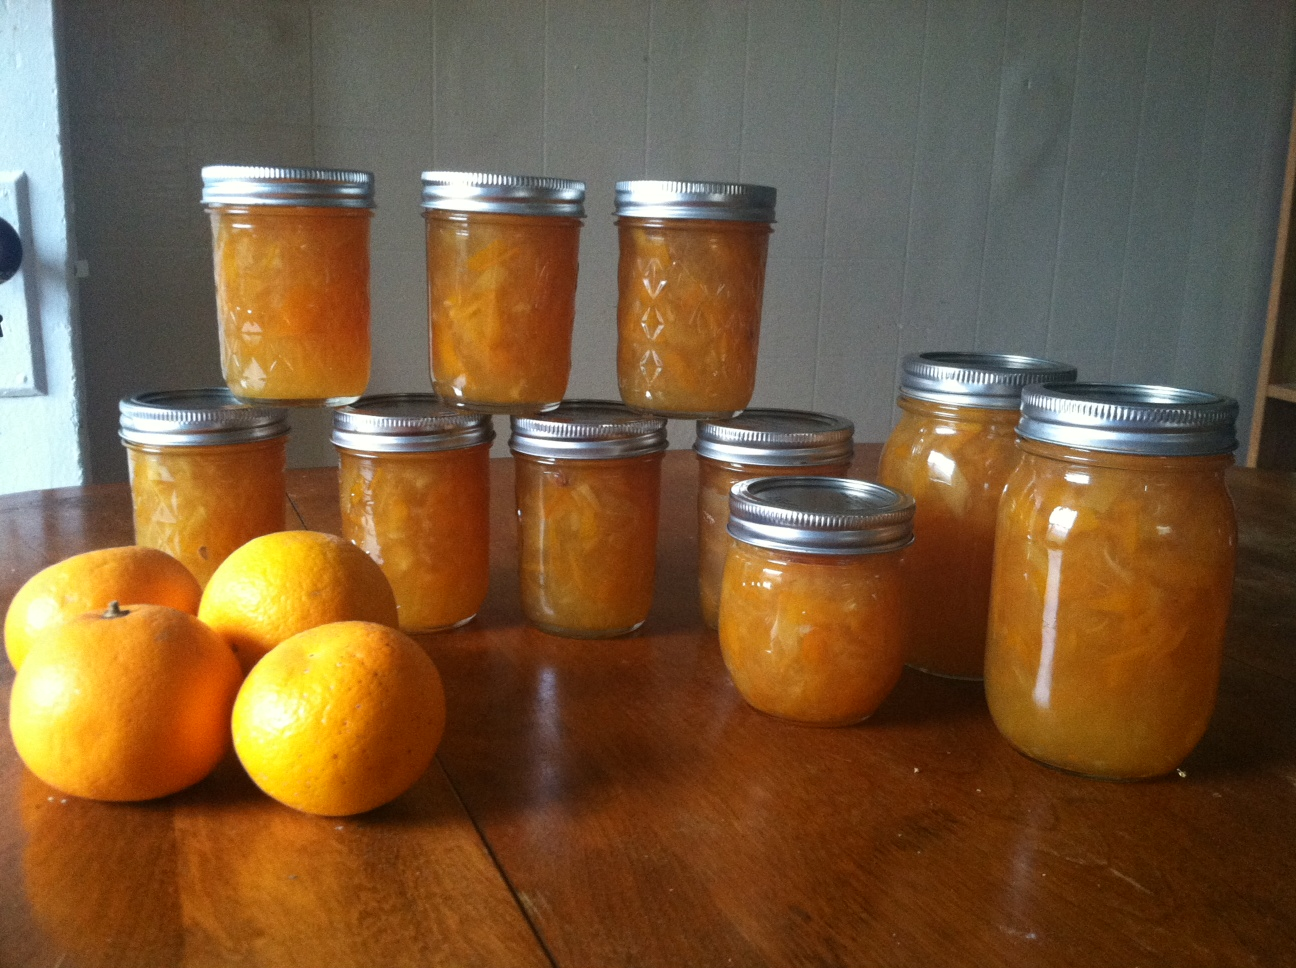 Catherine's marmalade